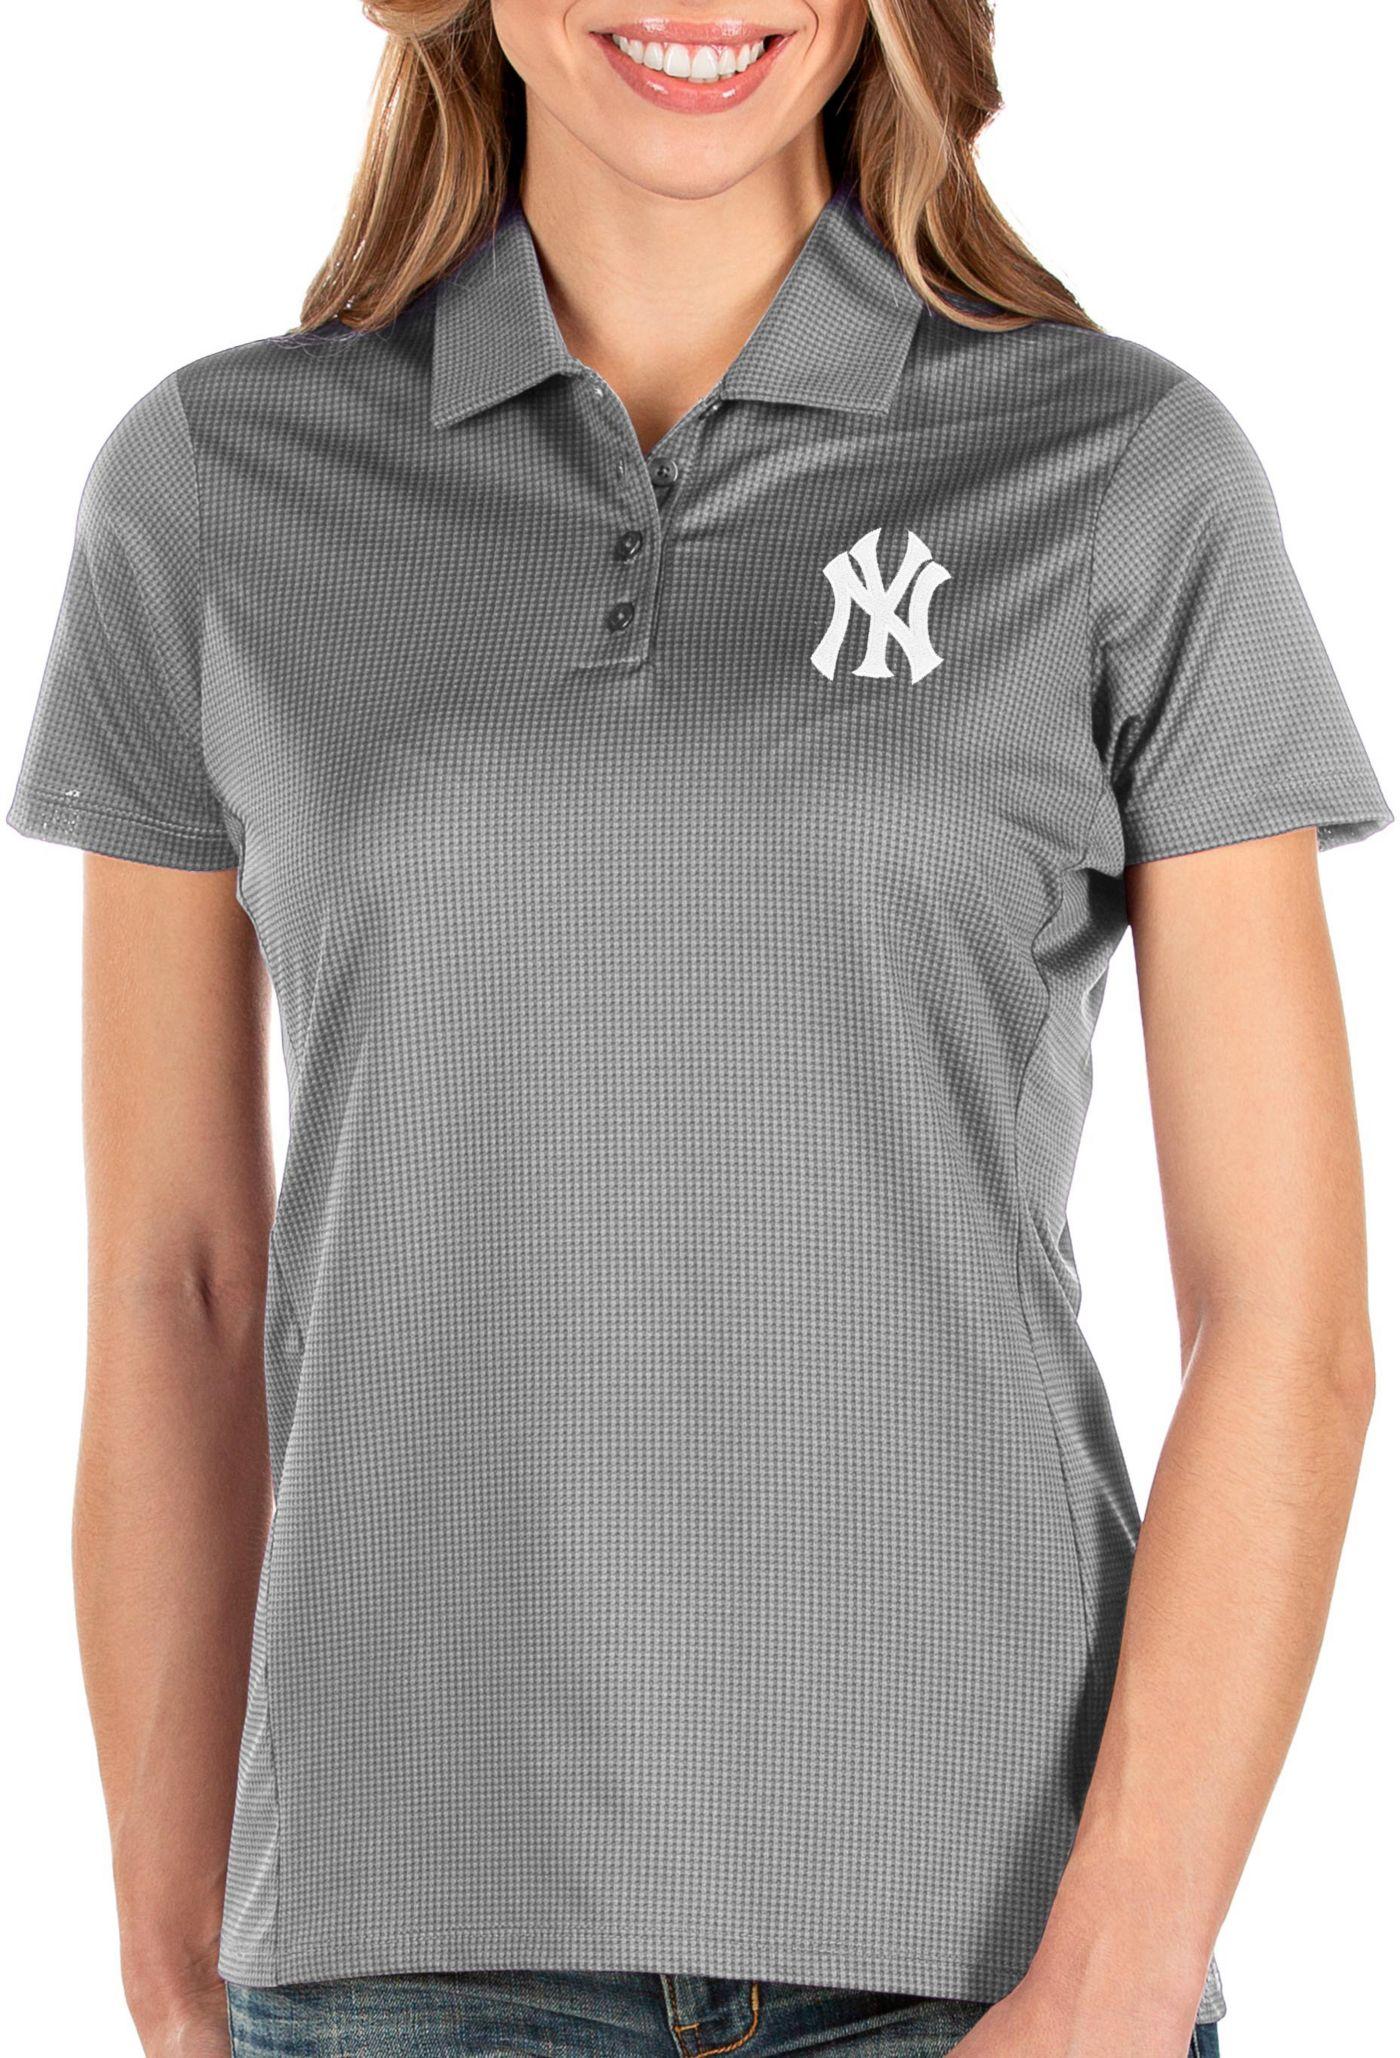 Antigua Women's New York Yankees Grey Balance Polo